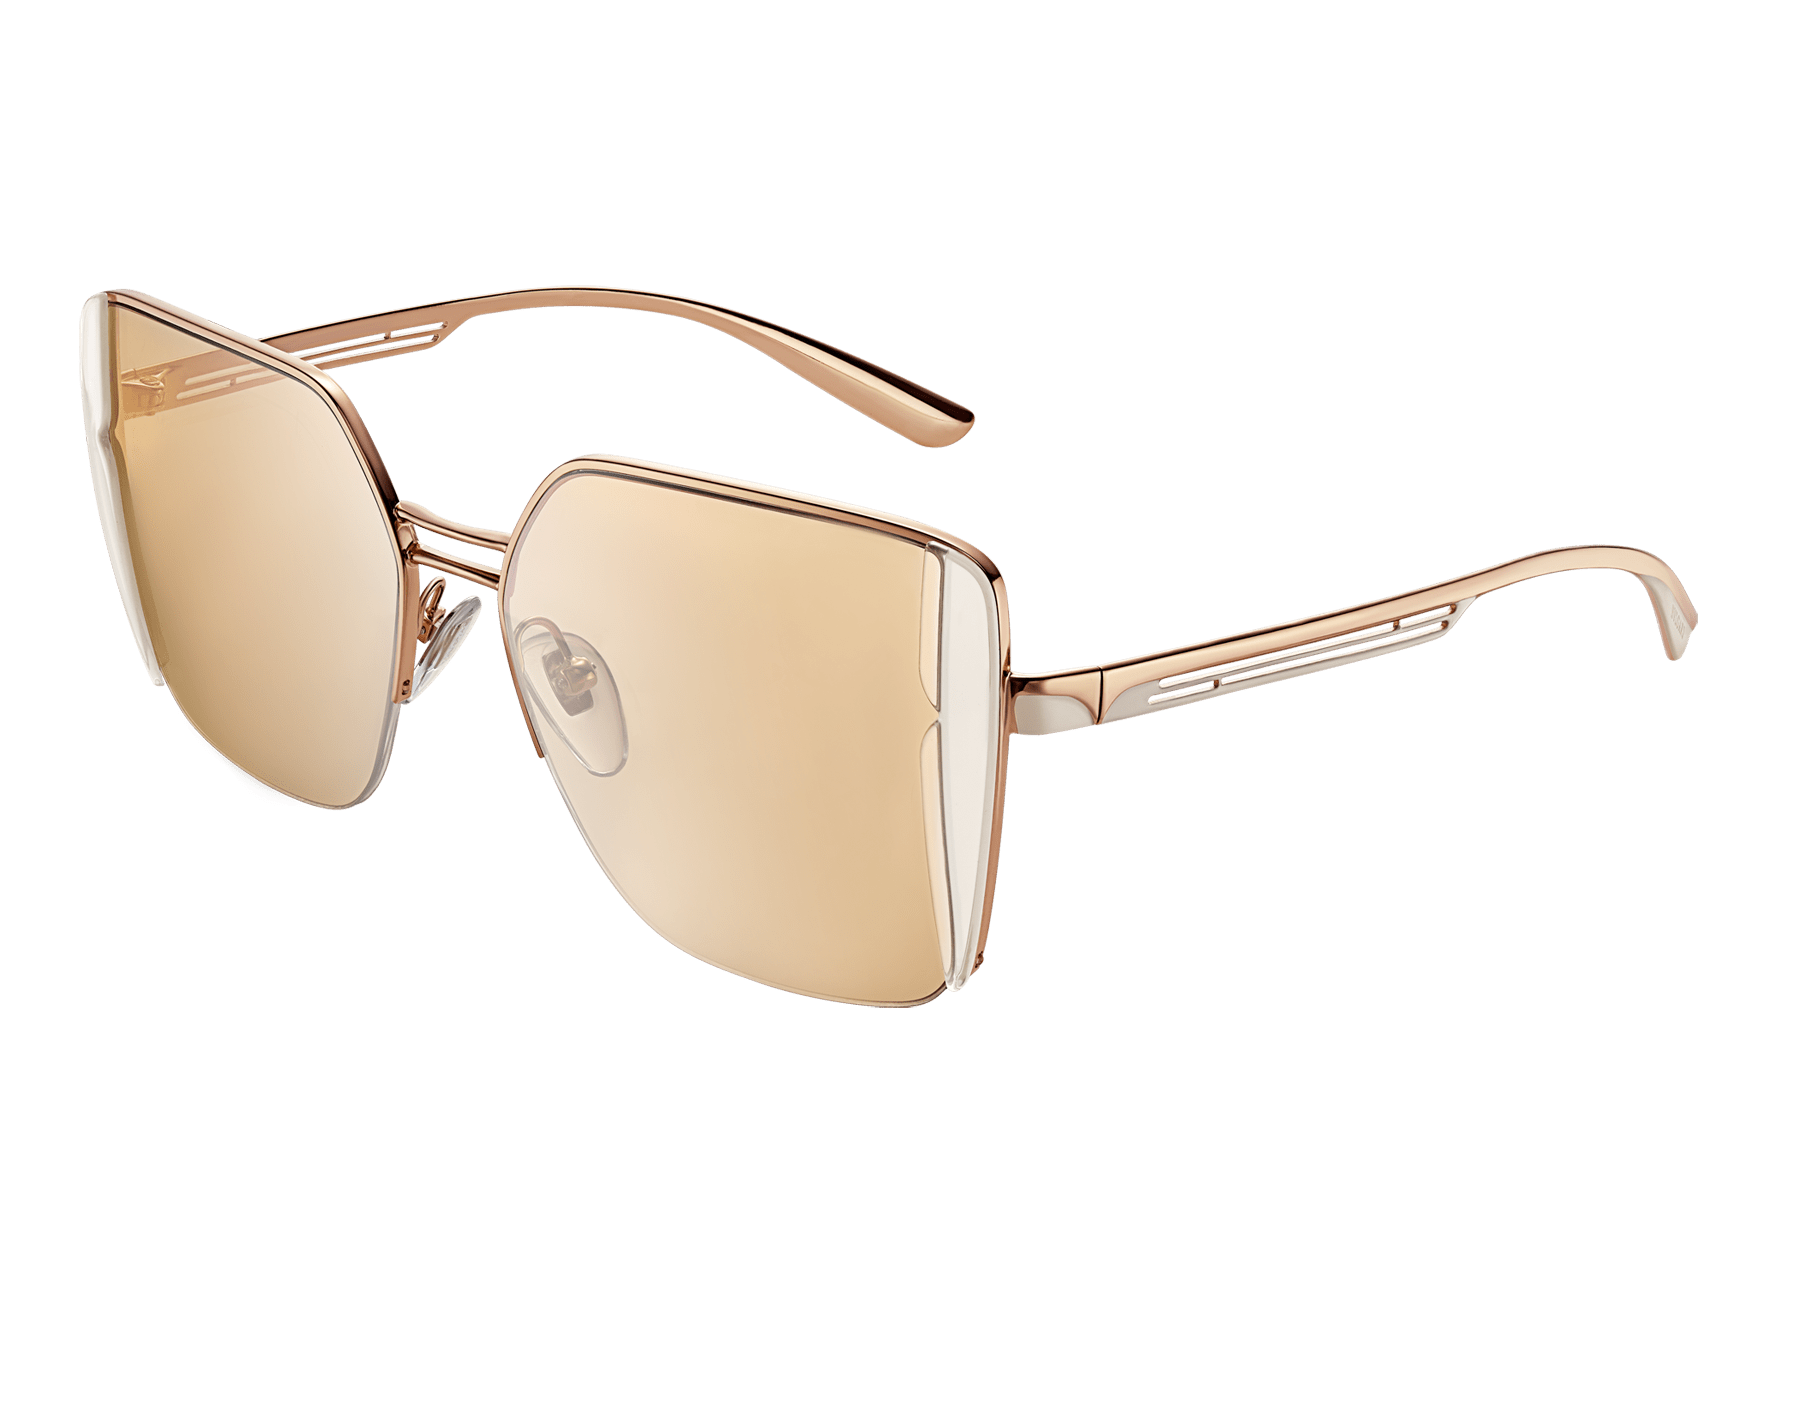 Bulgari B.zero1 B.purebright metal squared sunglasses. 903948 image 1